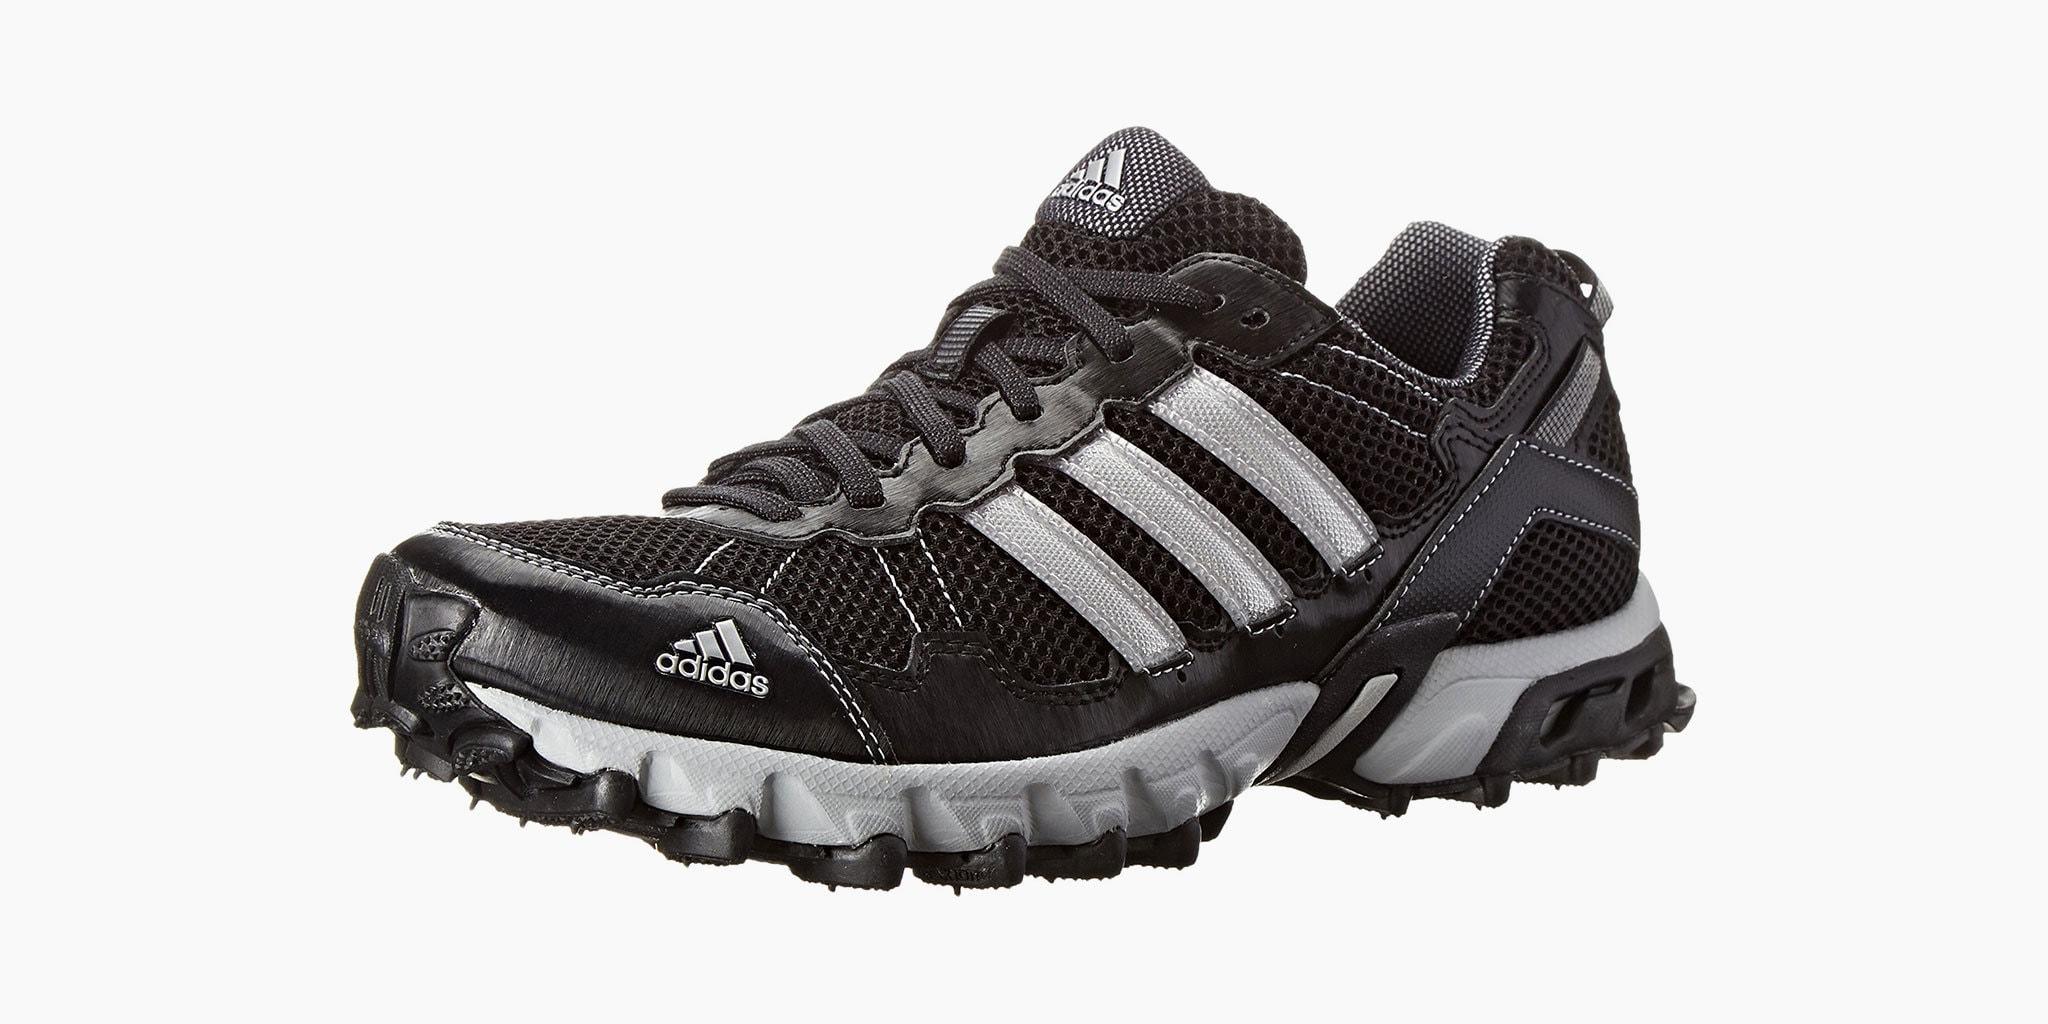 Adidas Thrasher Trail Running Shoes Reviews